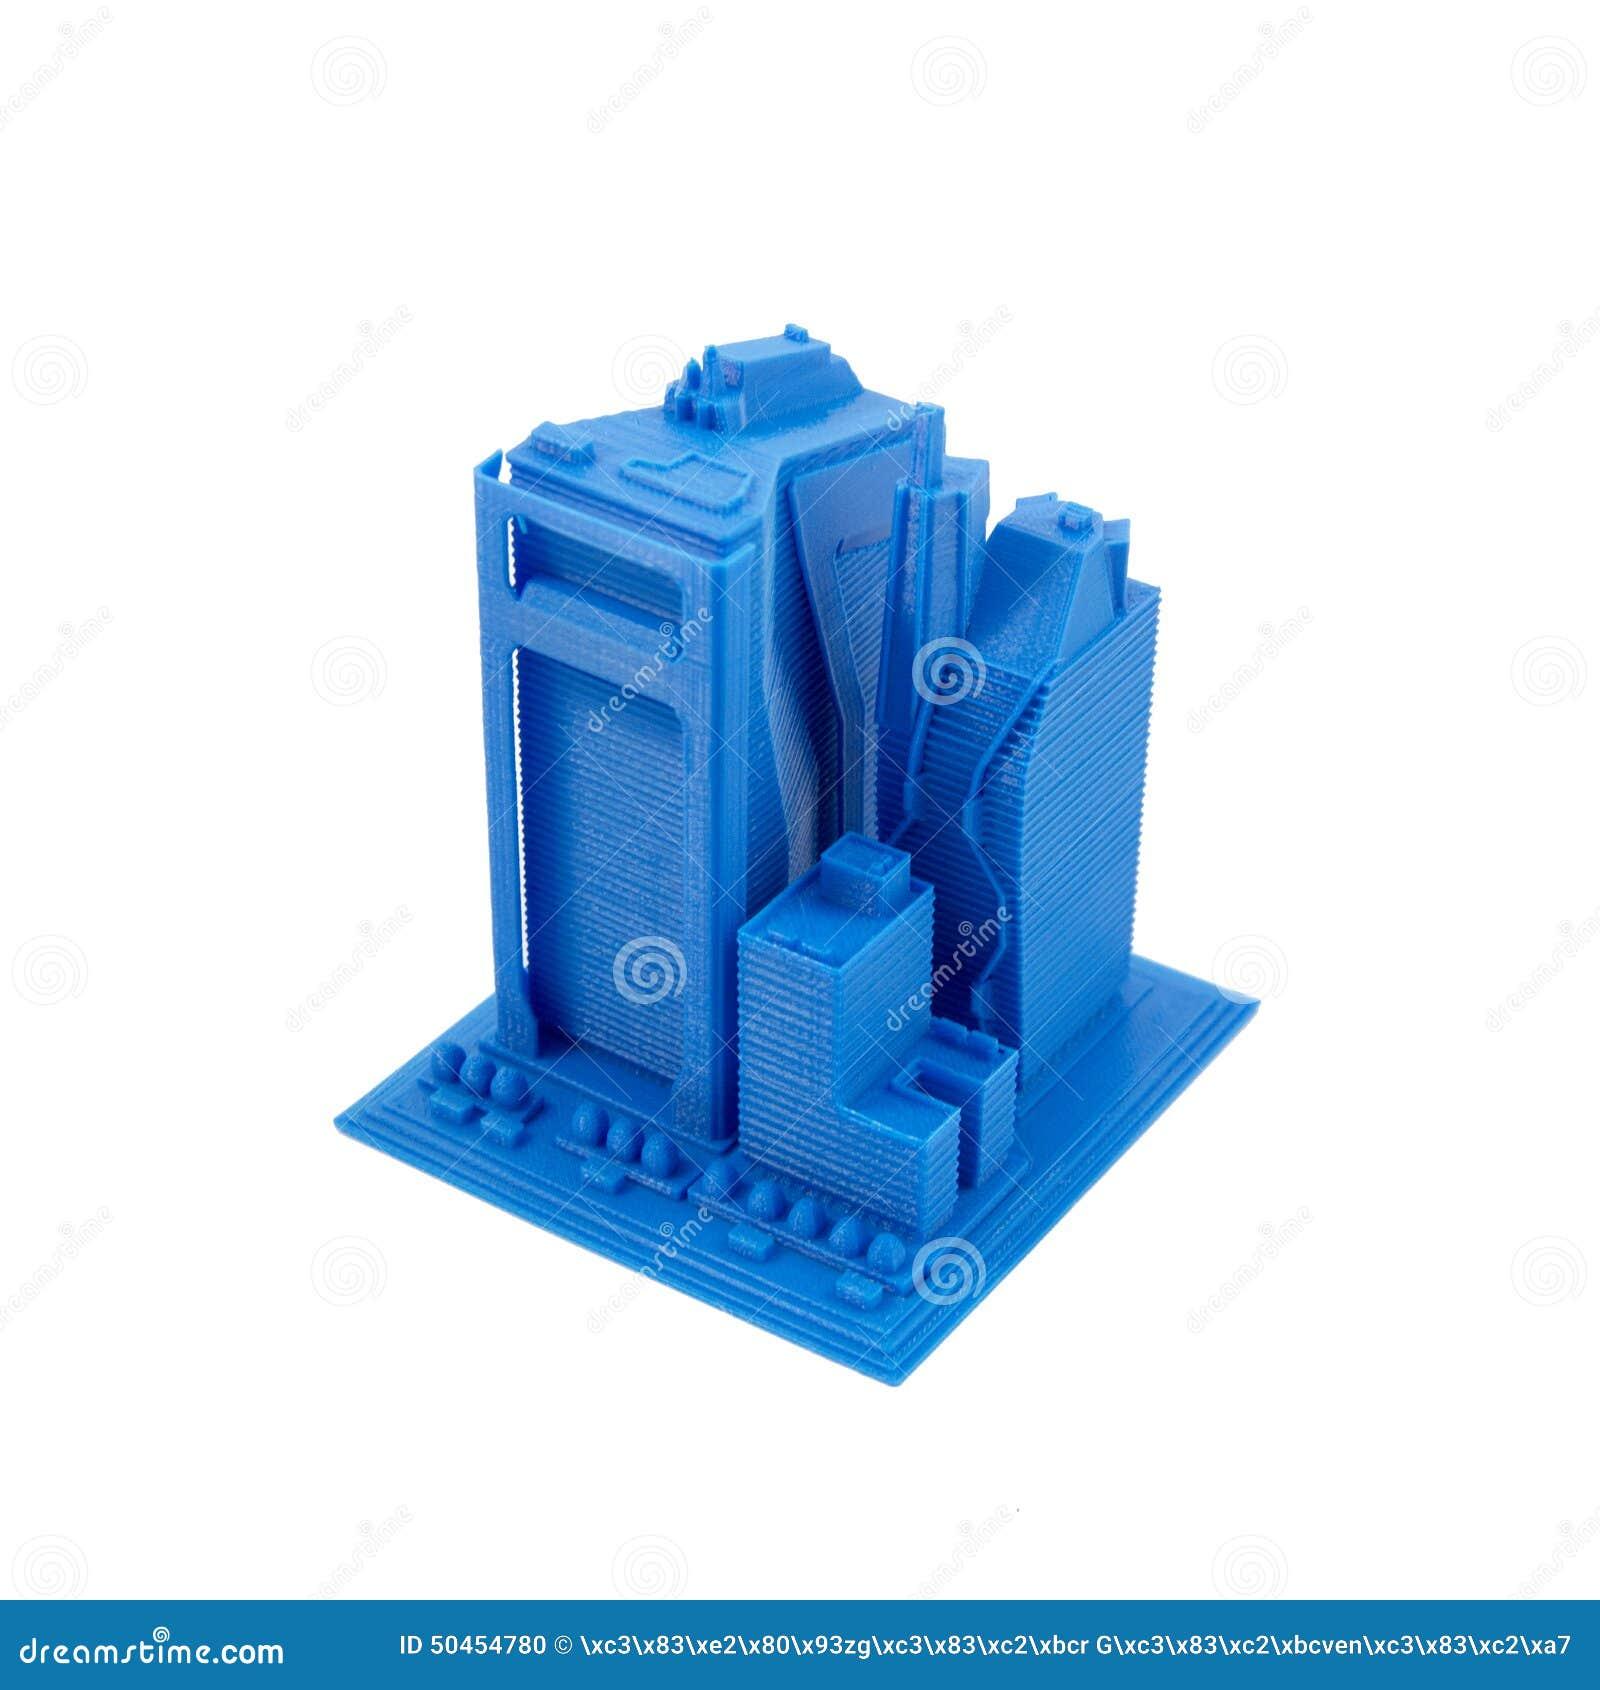 Of Skyscrapers modelo impresso 3D